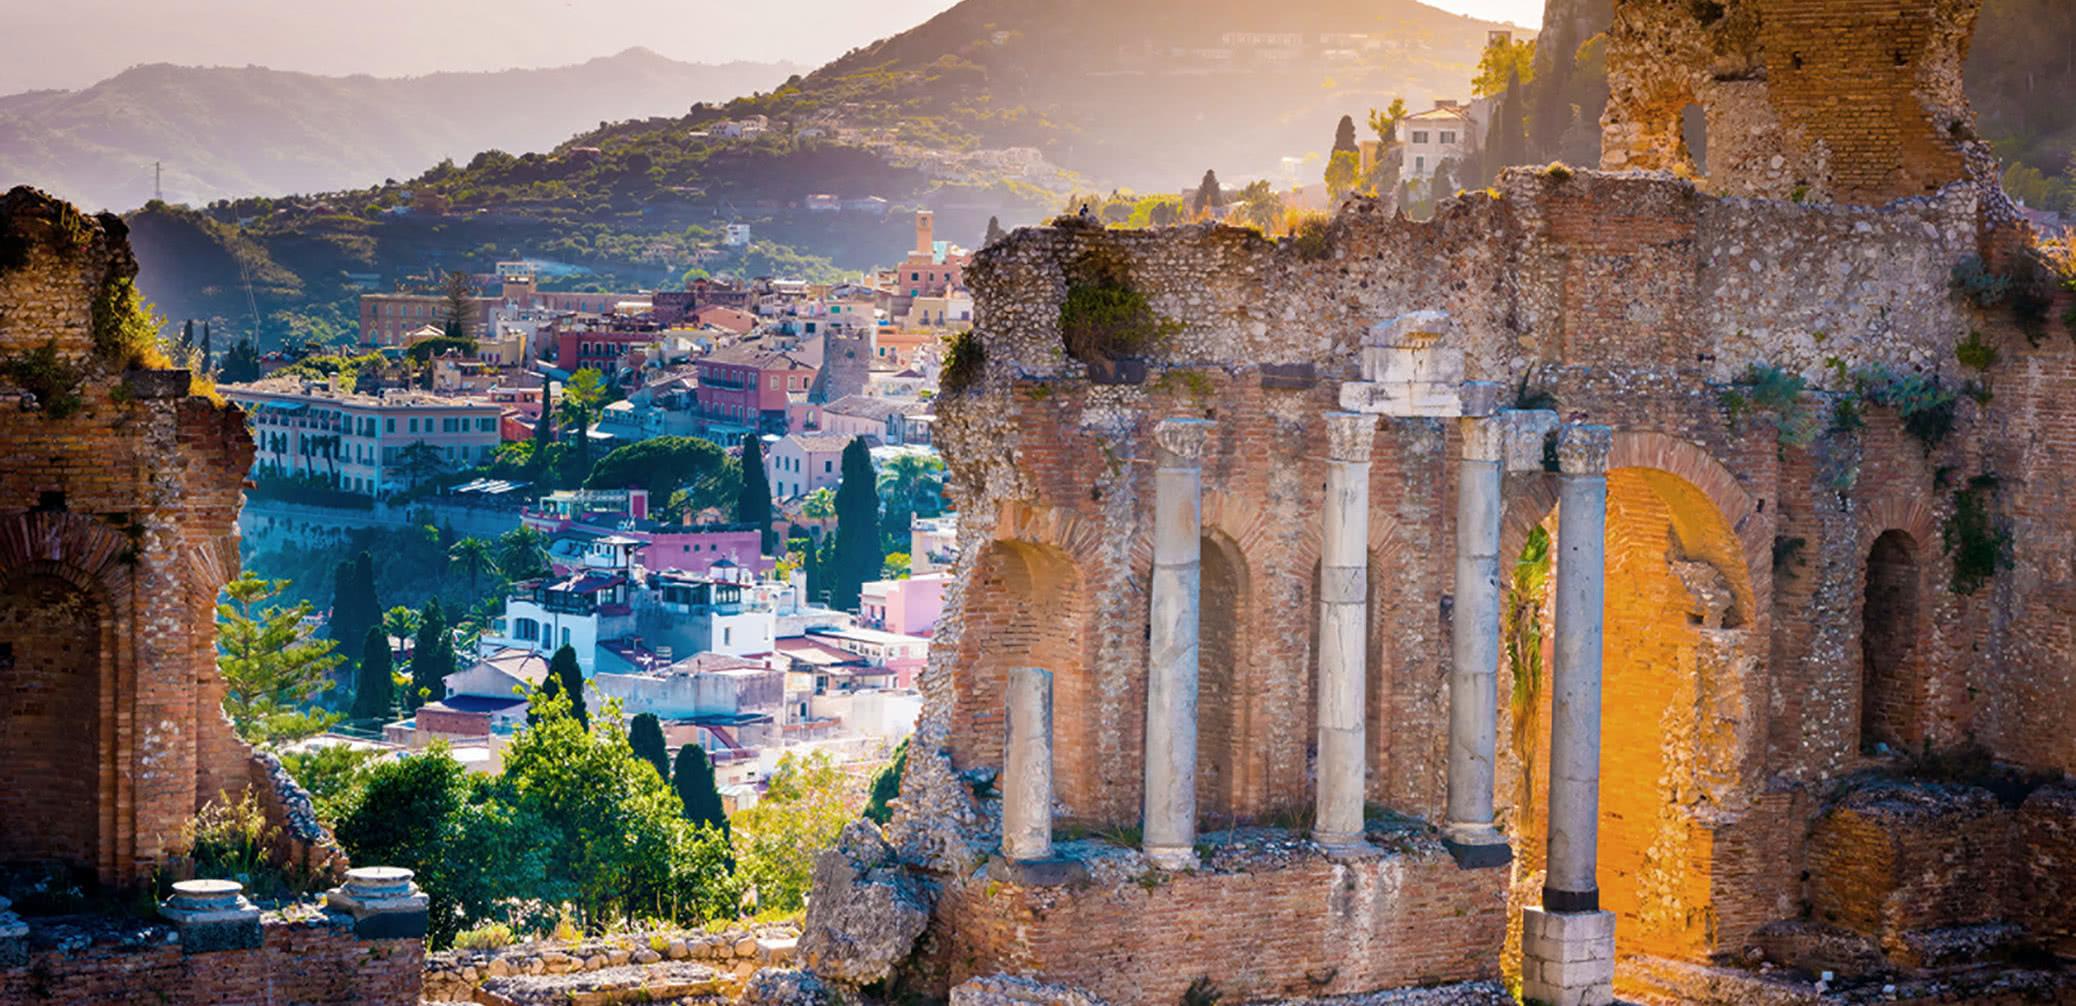 Review: San Domenico Palace, Taormina, A Four Seasons Hotel